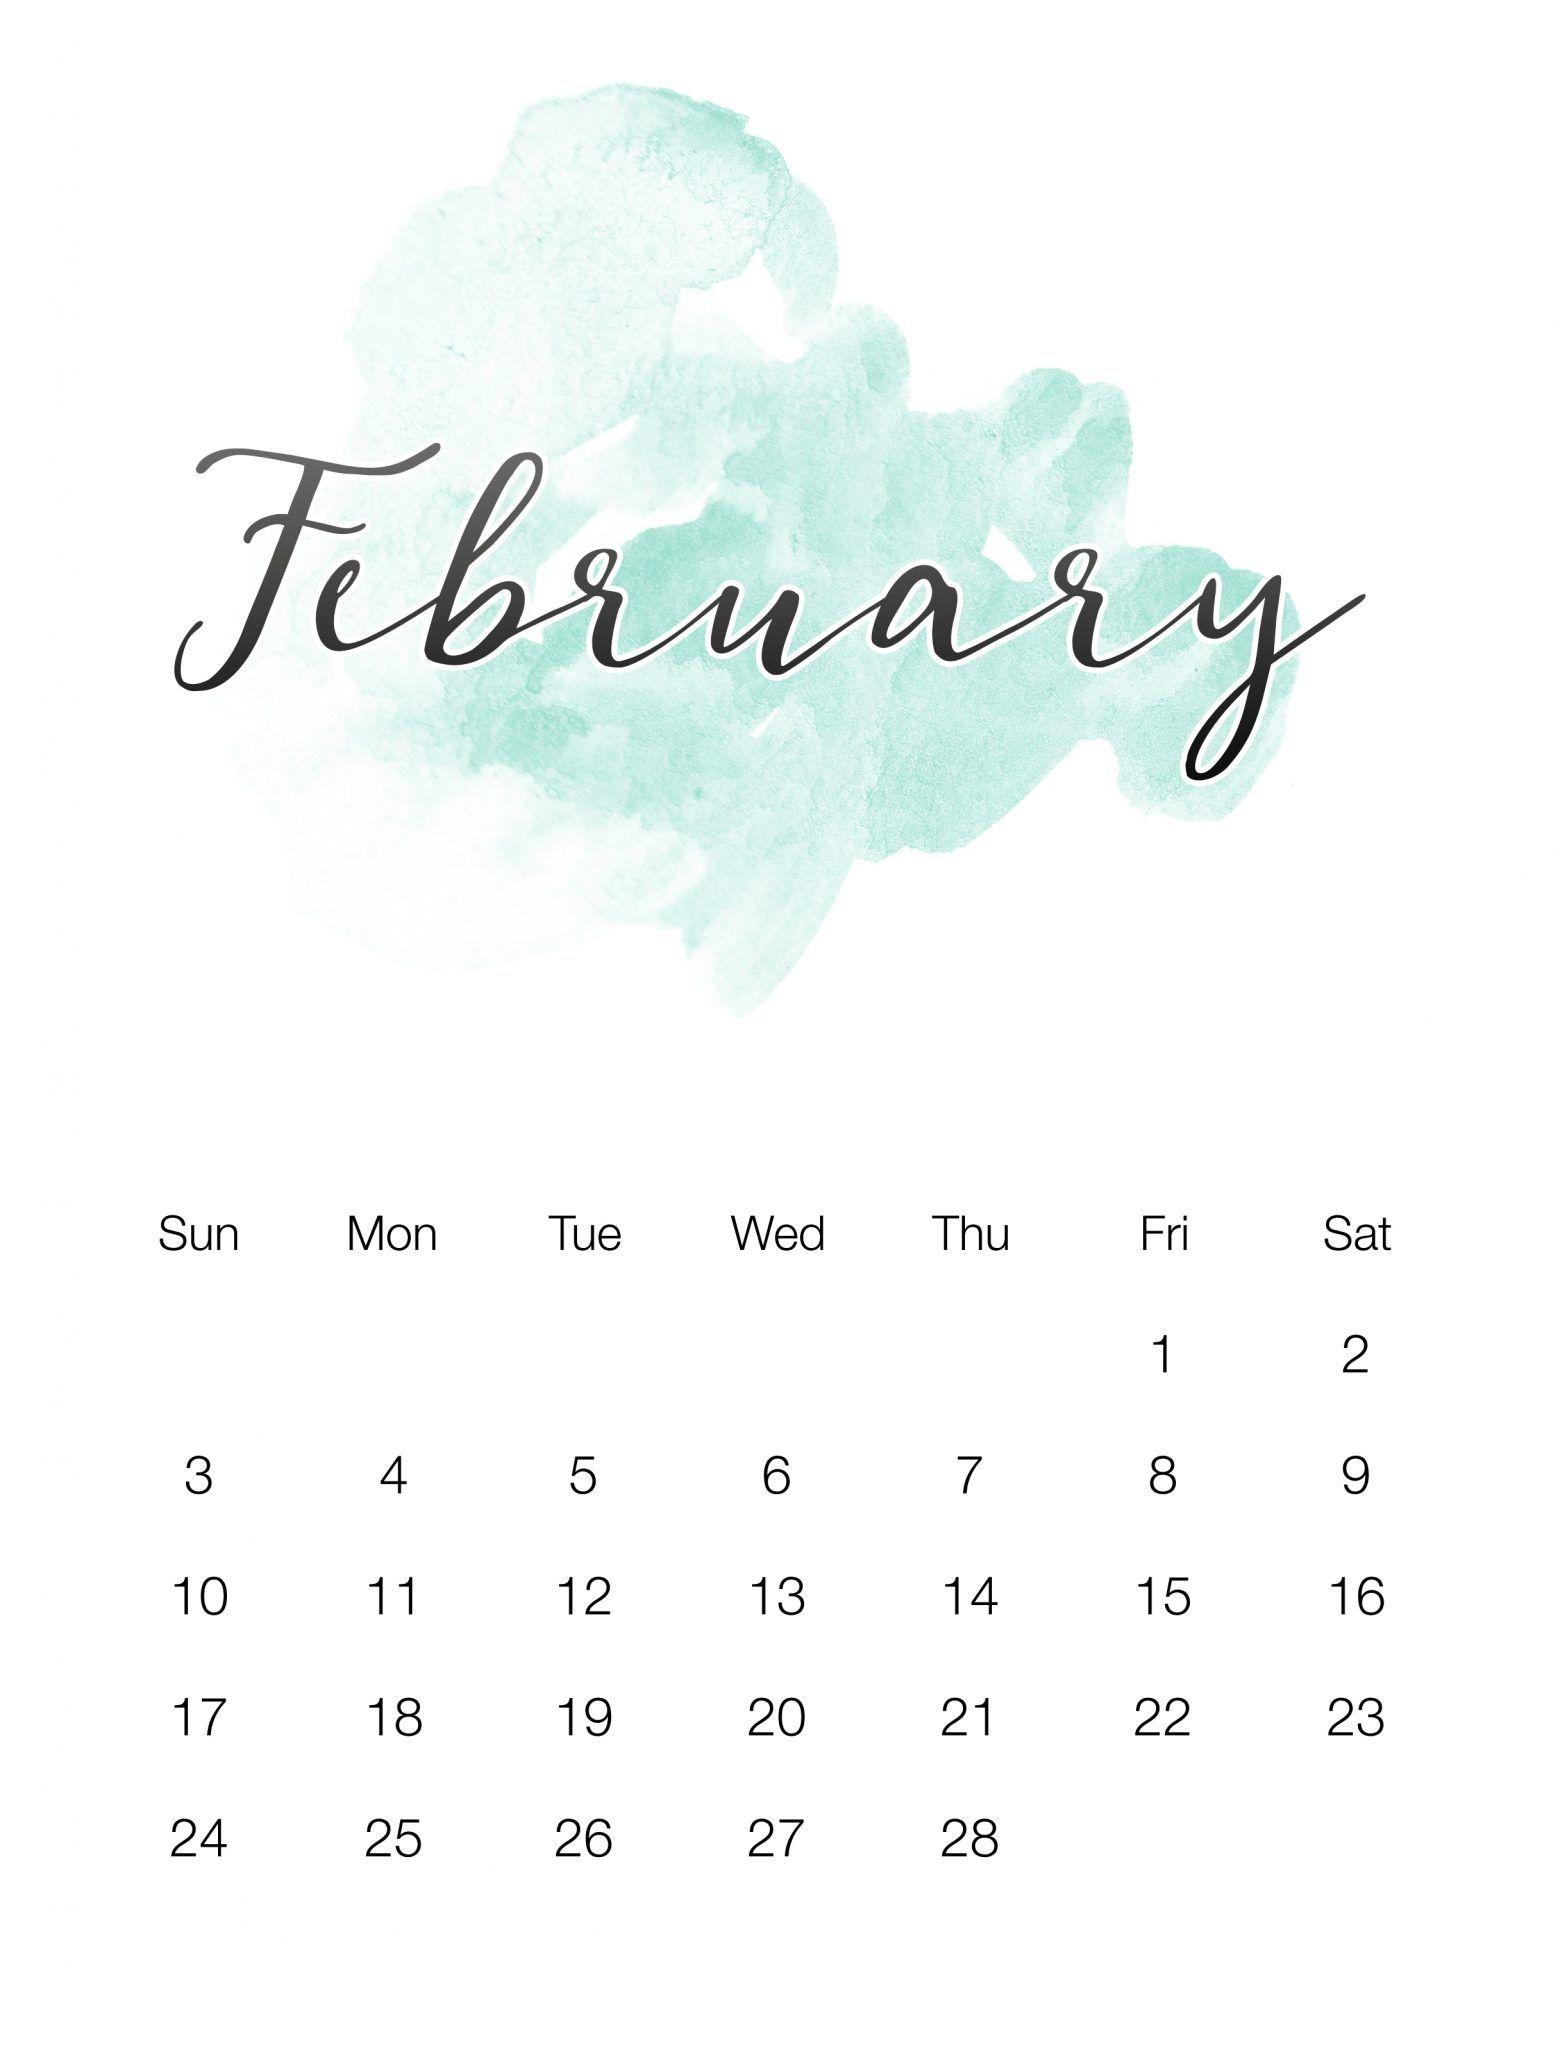 February Cute Desktop Calendar 2019 Cute February 2019 Calendar Wallpaper | Calendar of February 2019